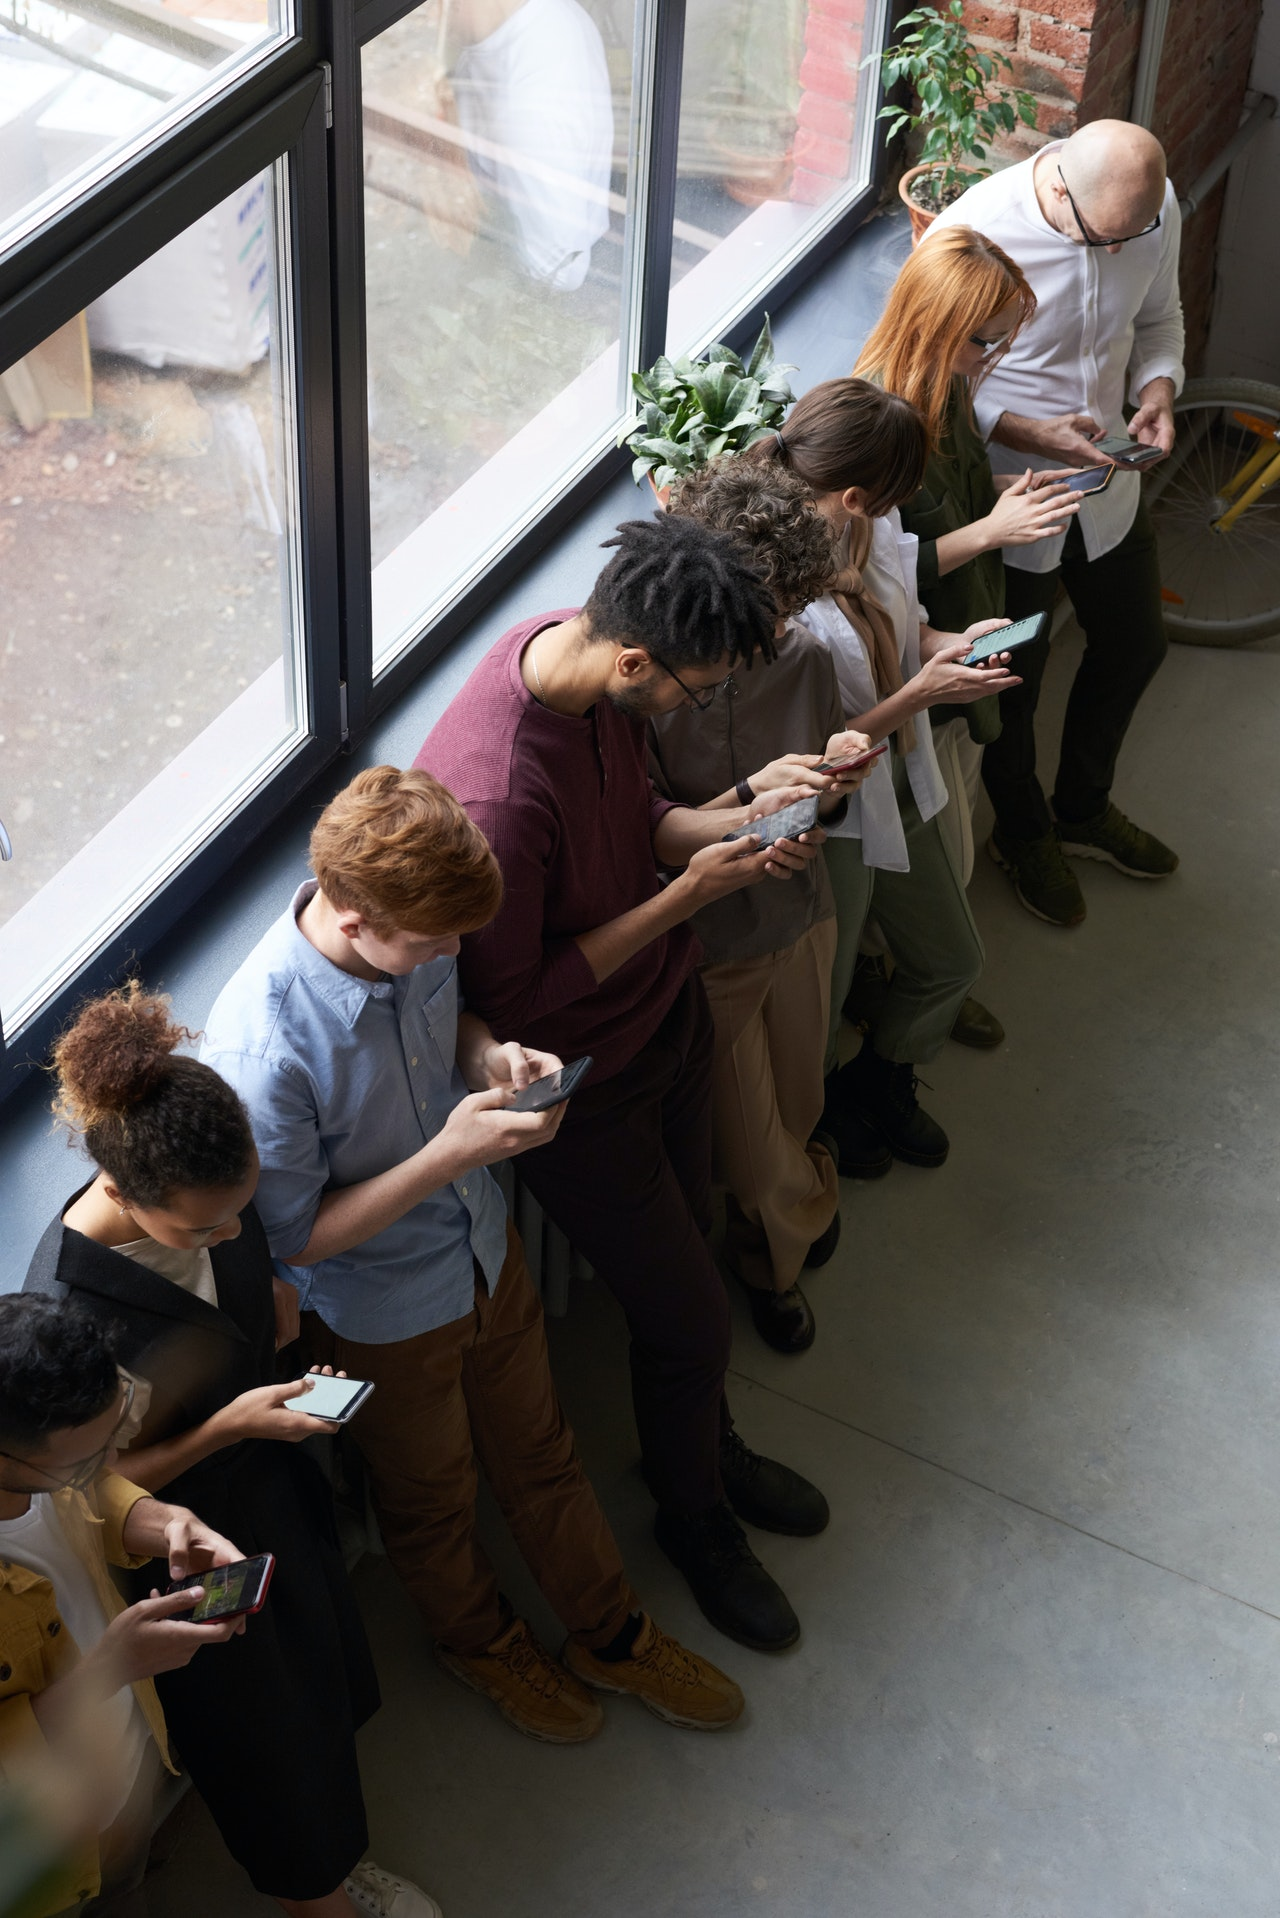 Social media crowd all using their phones